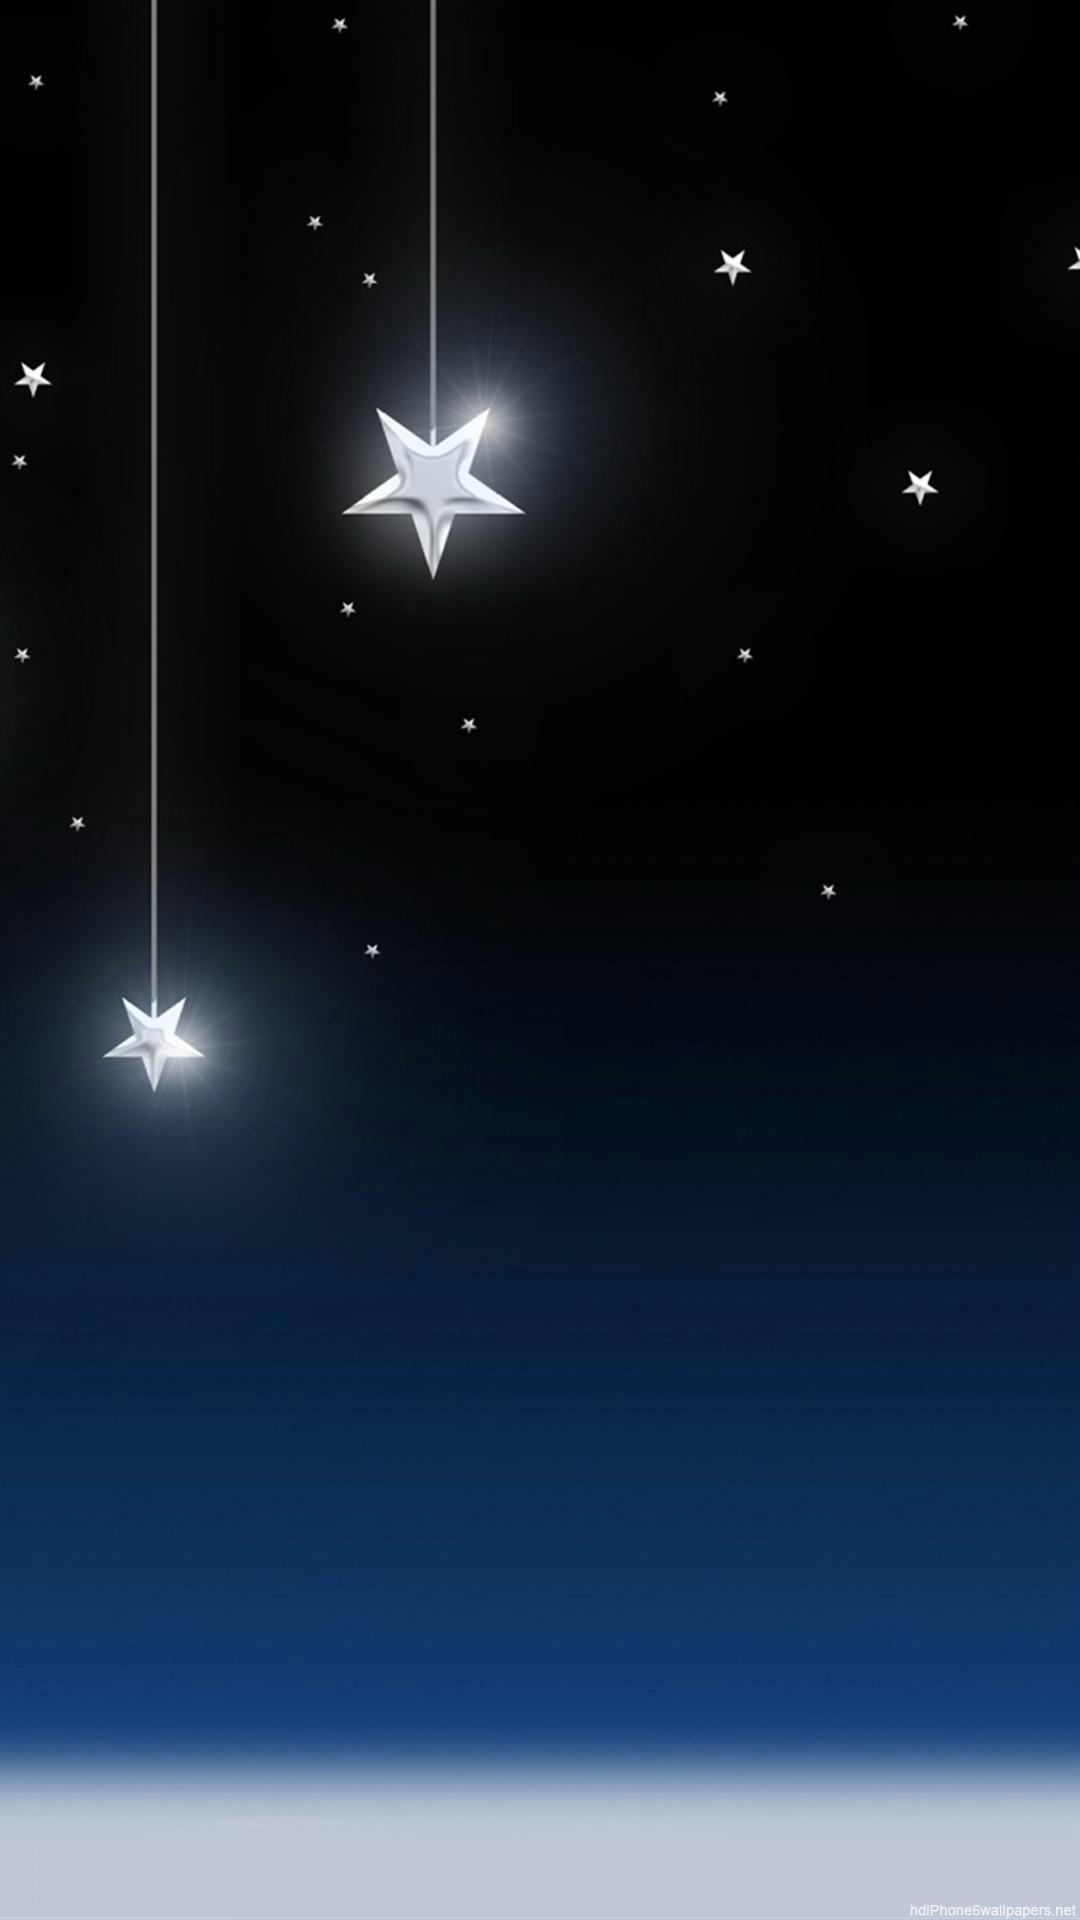 Moon And Stars Desktop Wallpaper 63 Images